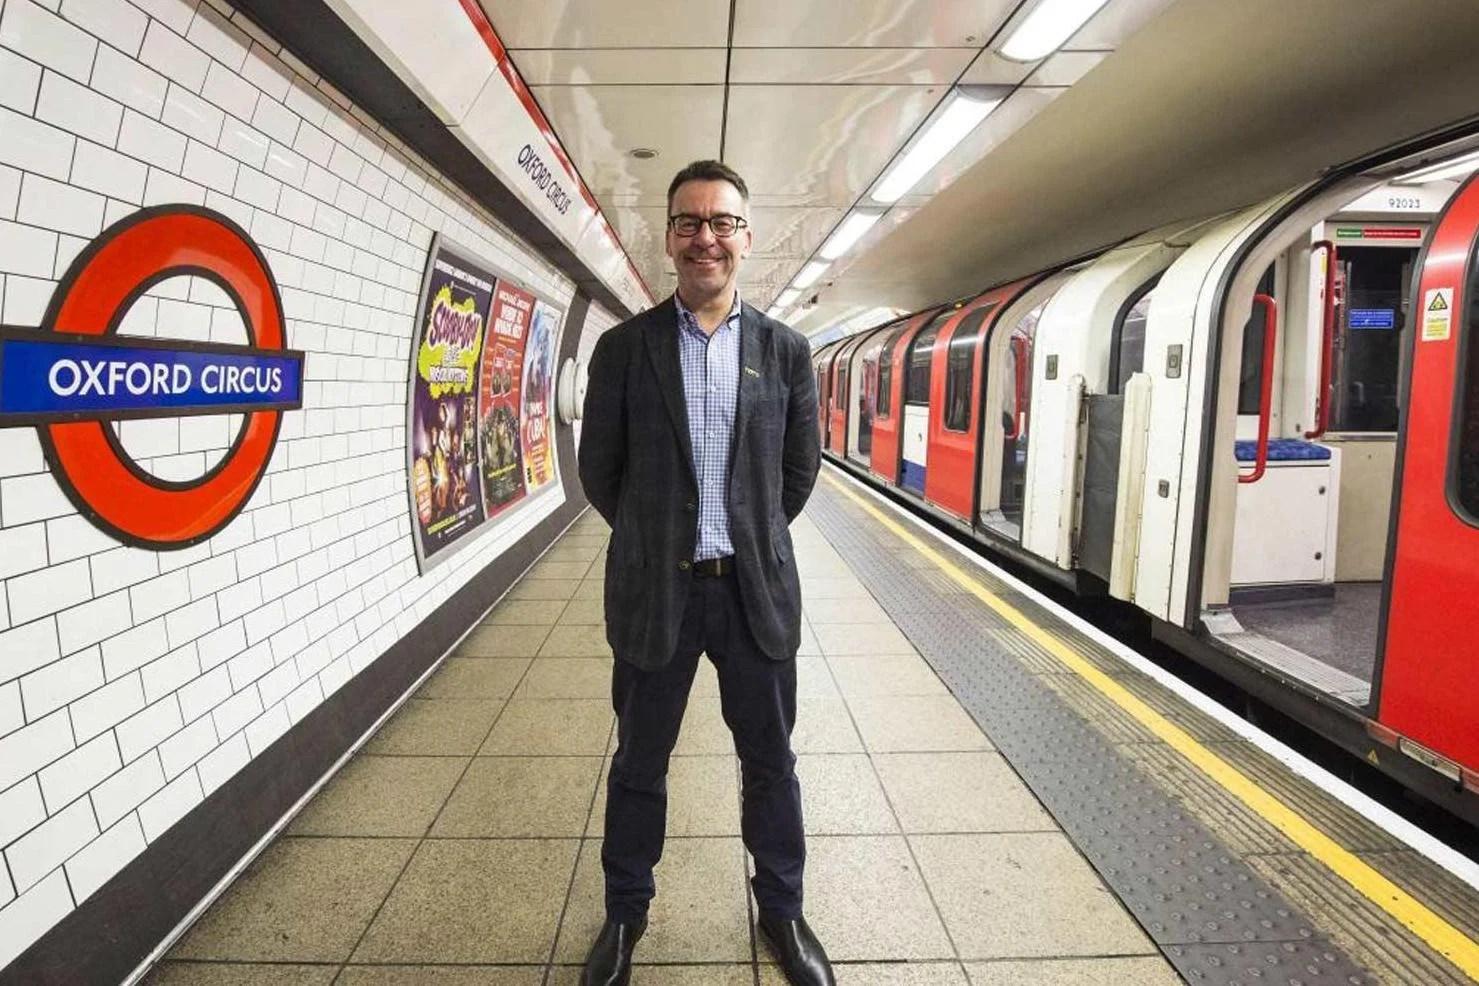 Night Tube Service Tfl Says 200000 Passengers Will Use